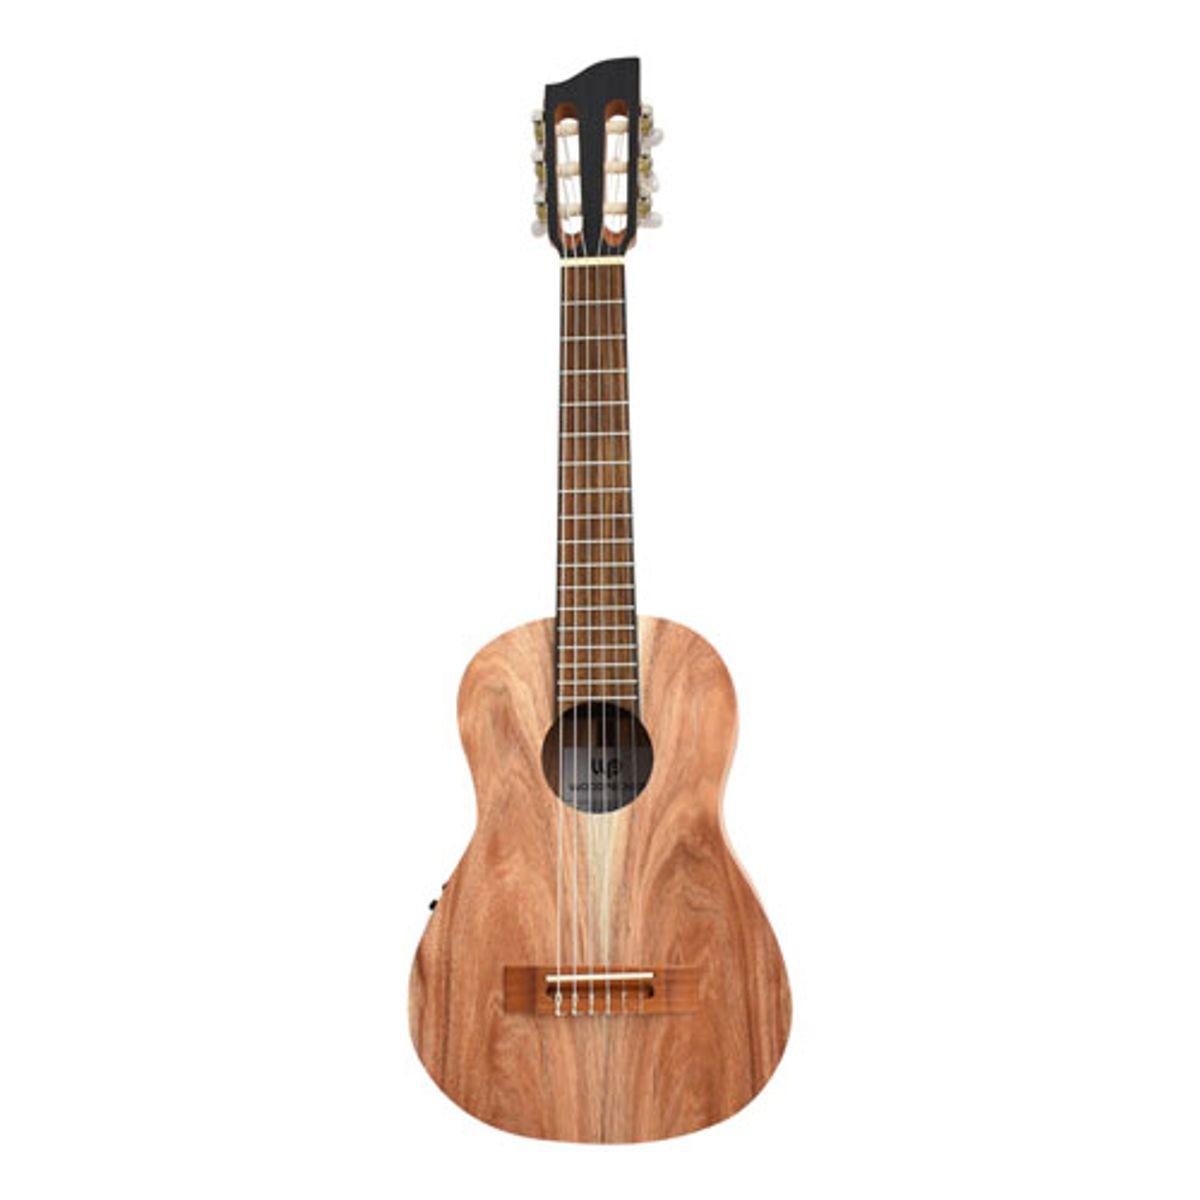 "Woodpecker Instruments Introduces the 31"" Travel Koa"